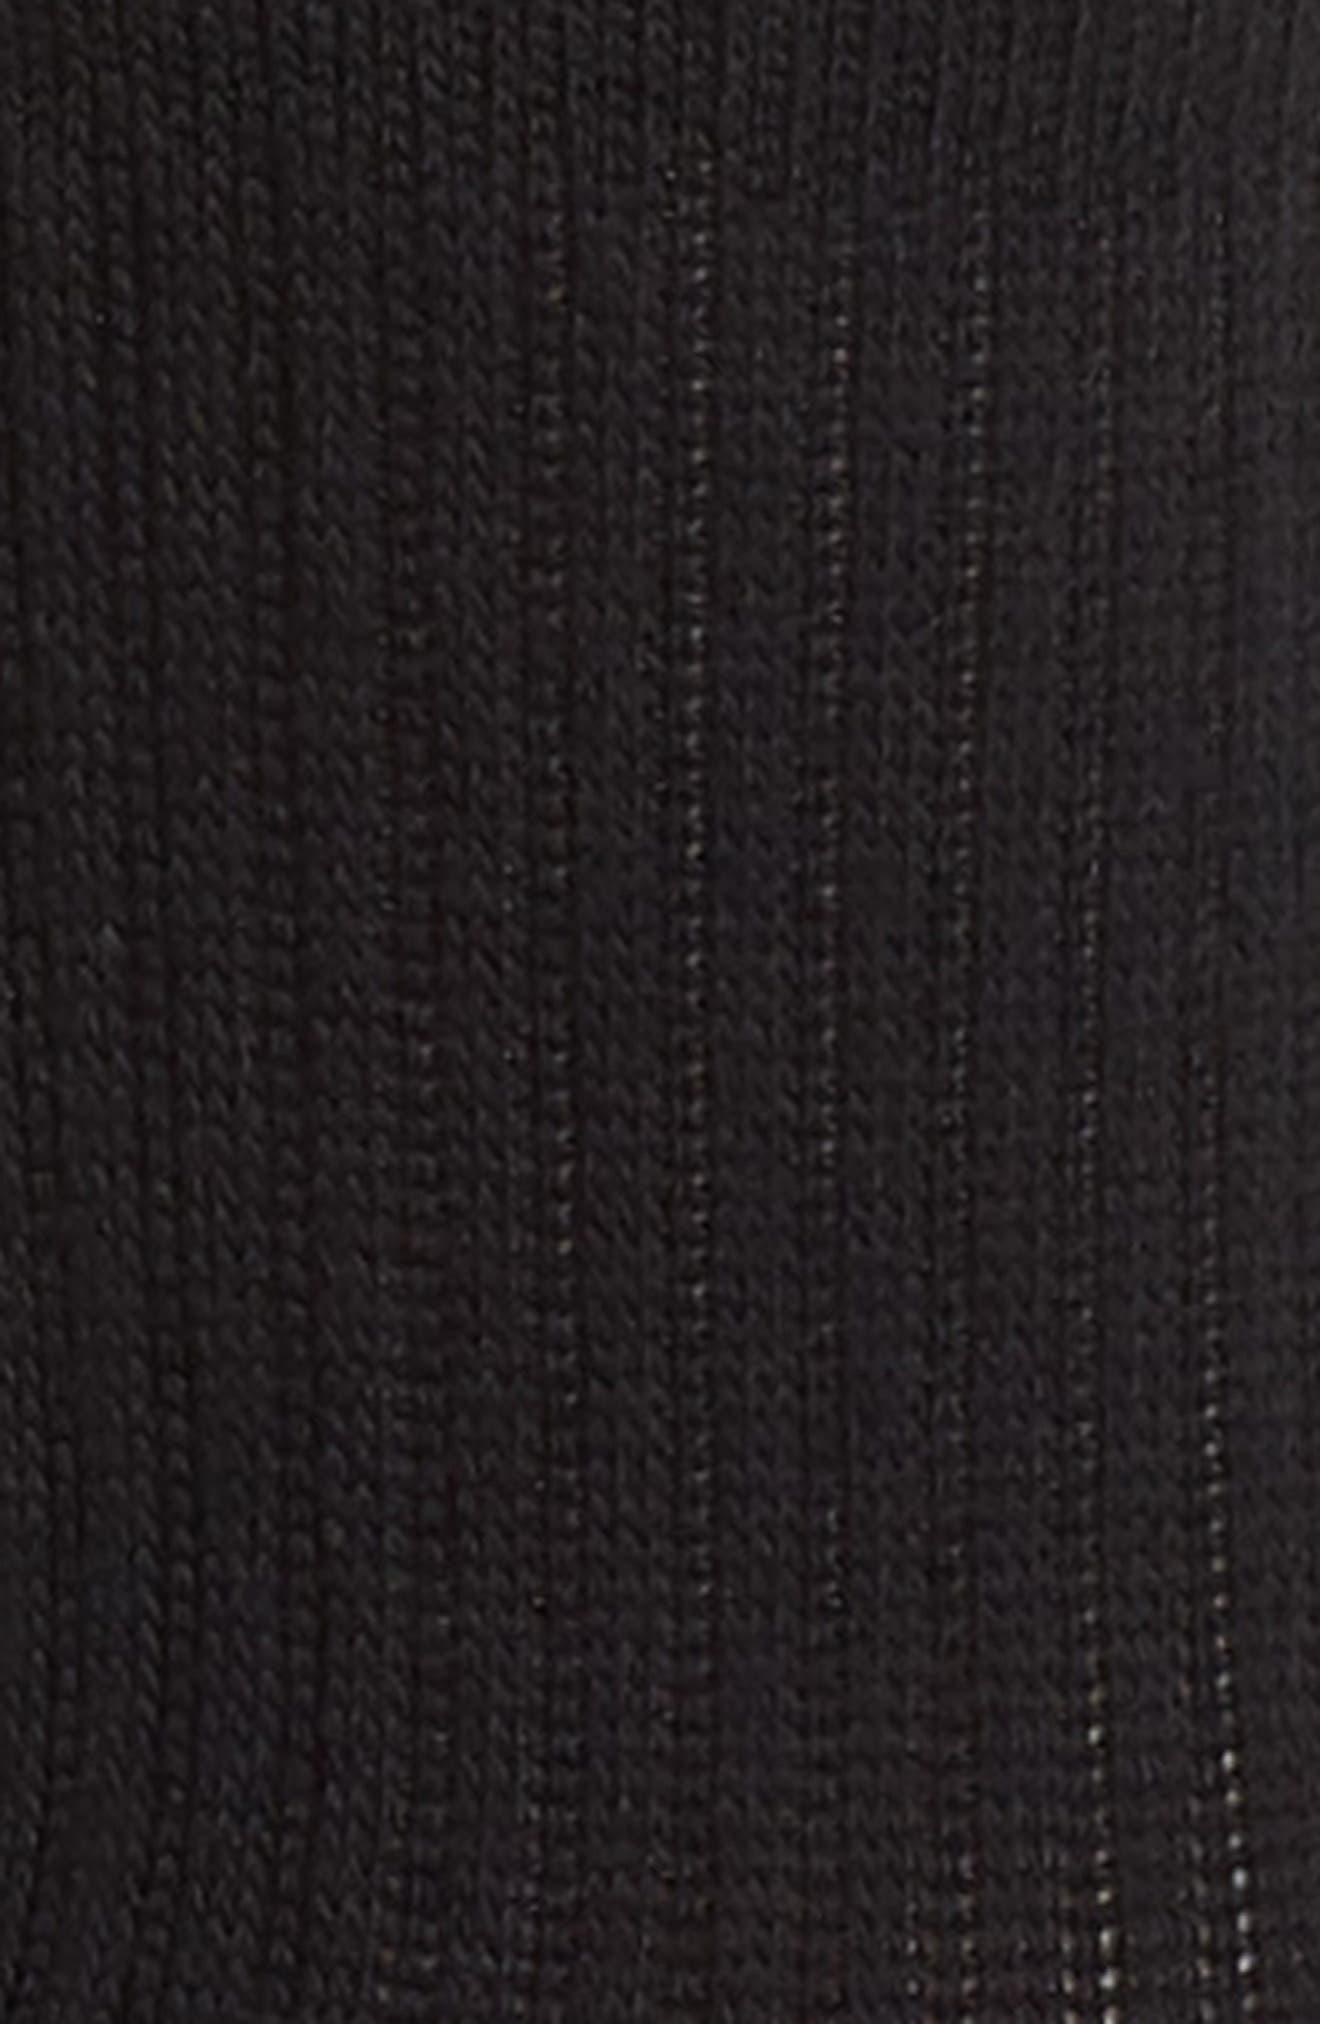 Quarter Crew Socks,                             Alternate thumbnail 2, color,                             001